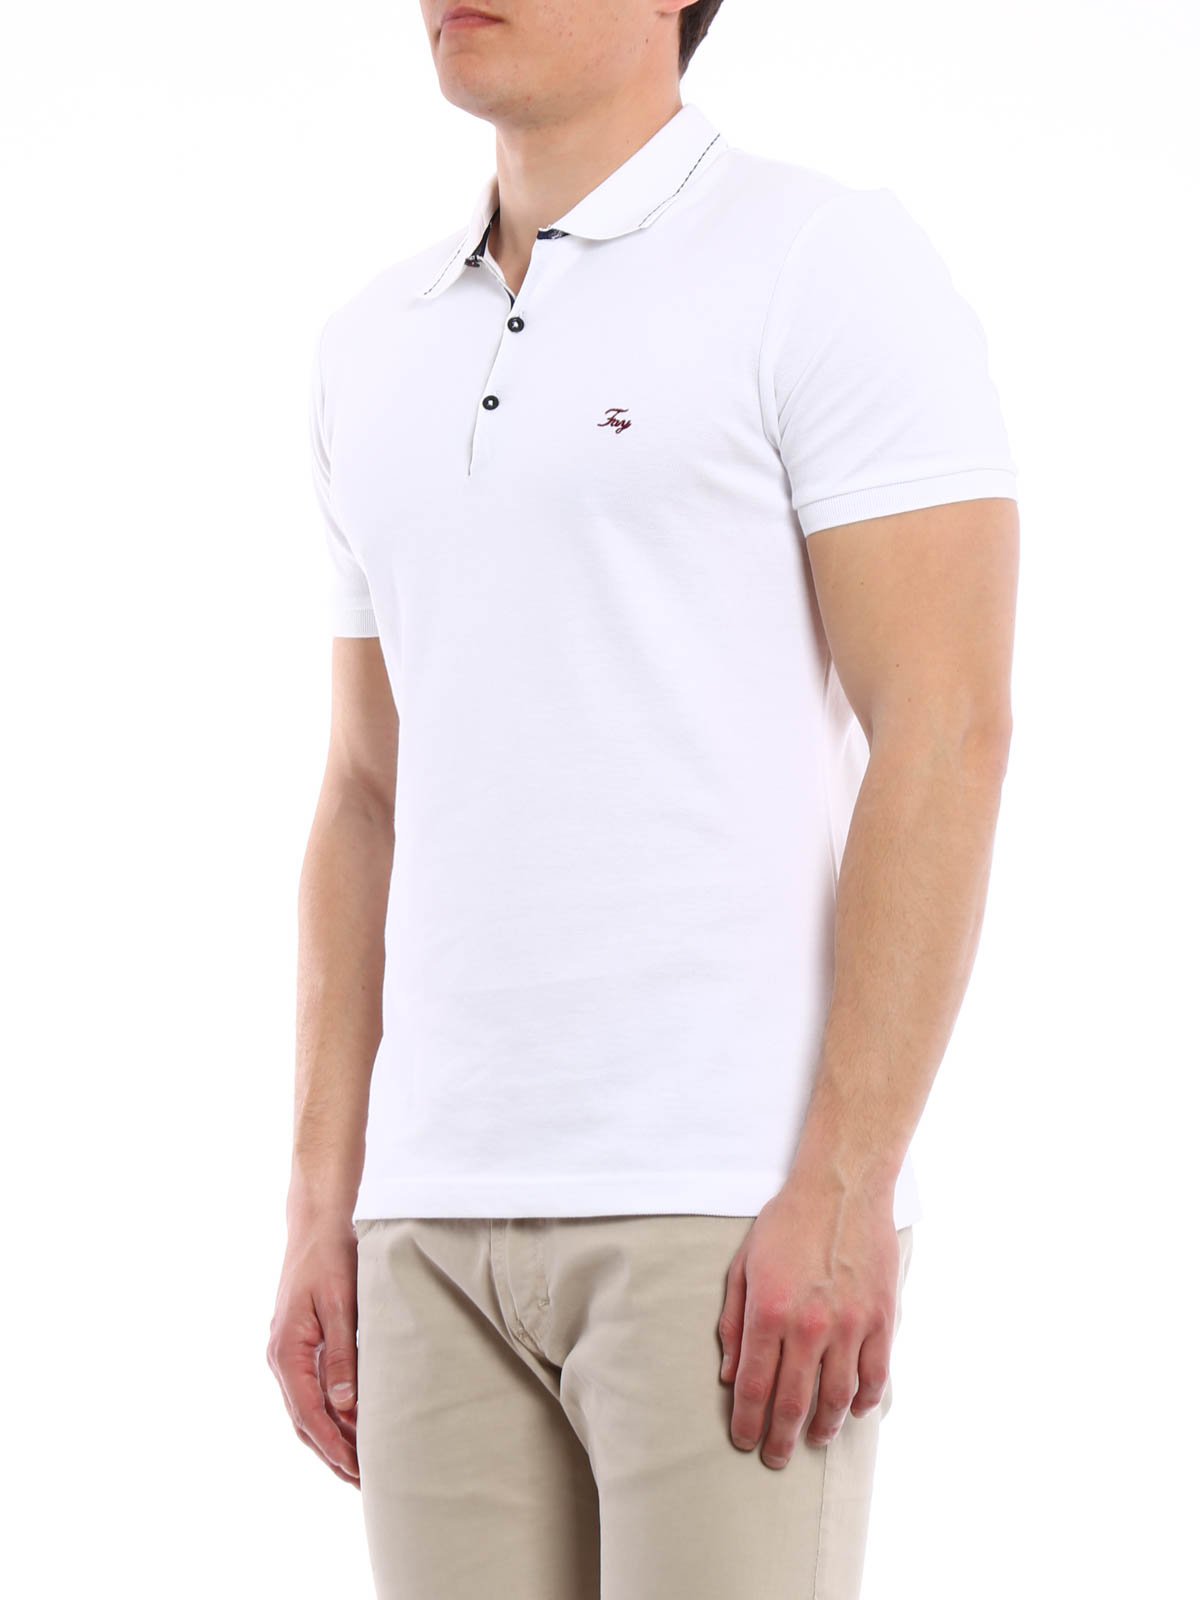 Cotton pique polo shirt by fay polo shirts ikrix for Cotton on polo shirt